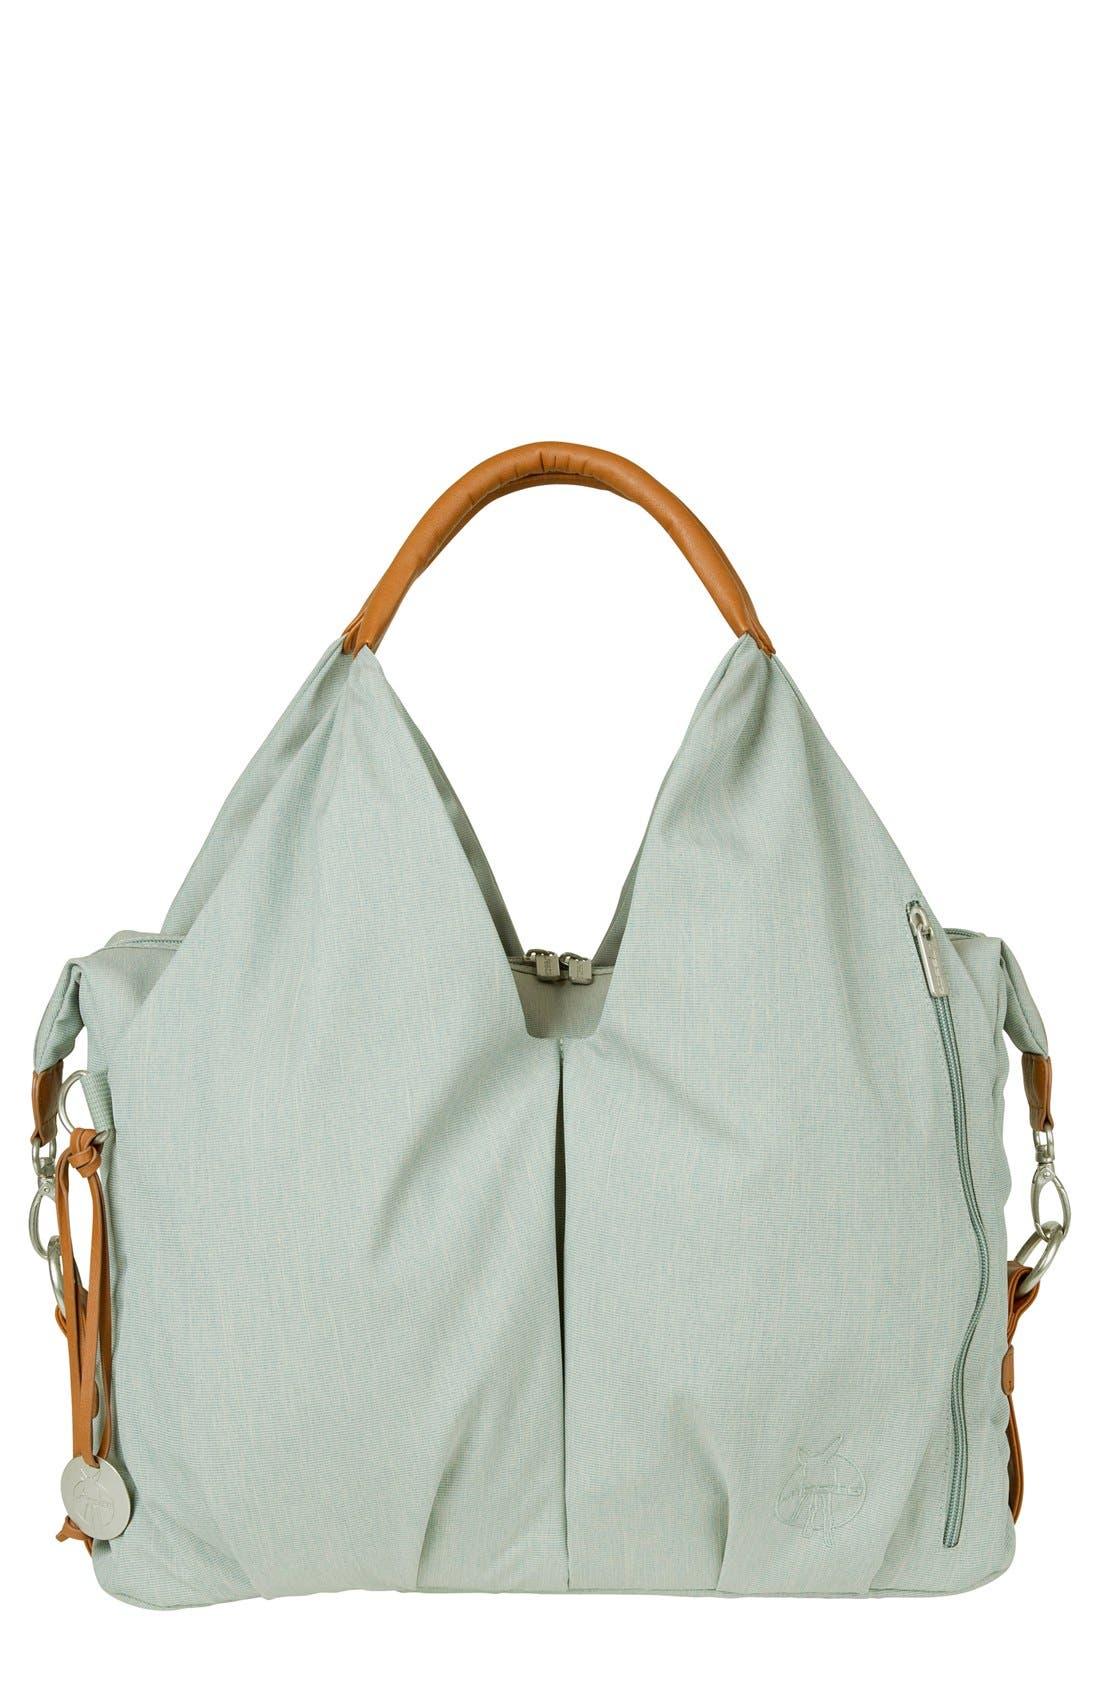 'Green Label - Neckline' Diaper Bag,                         Main,                         color, SKY BLUE/ BROWN